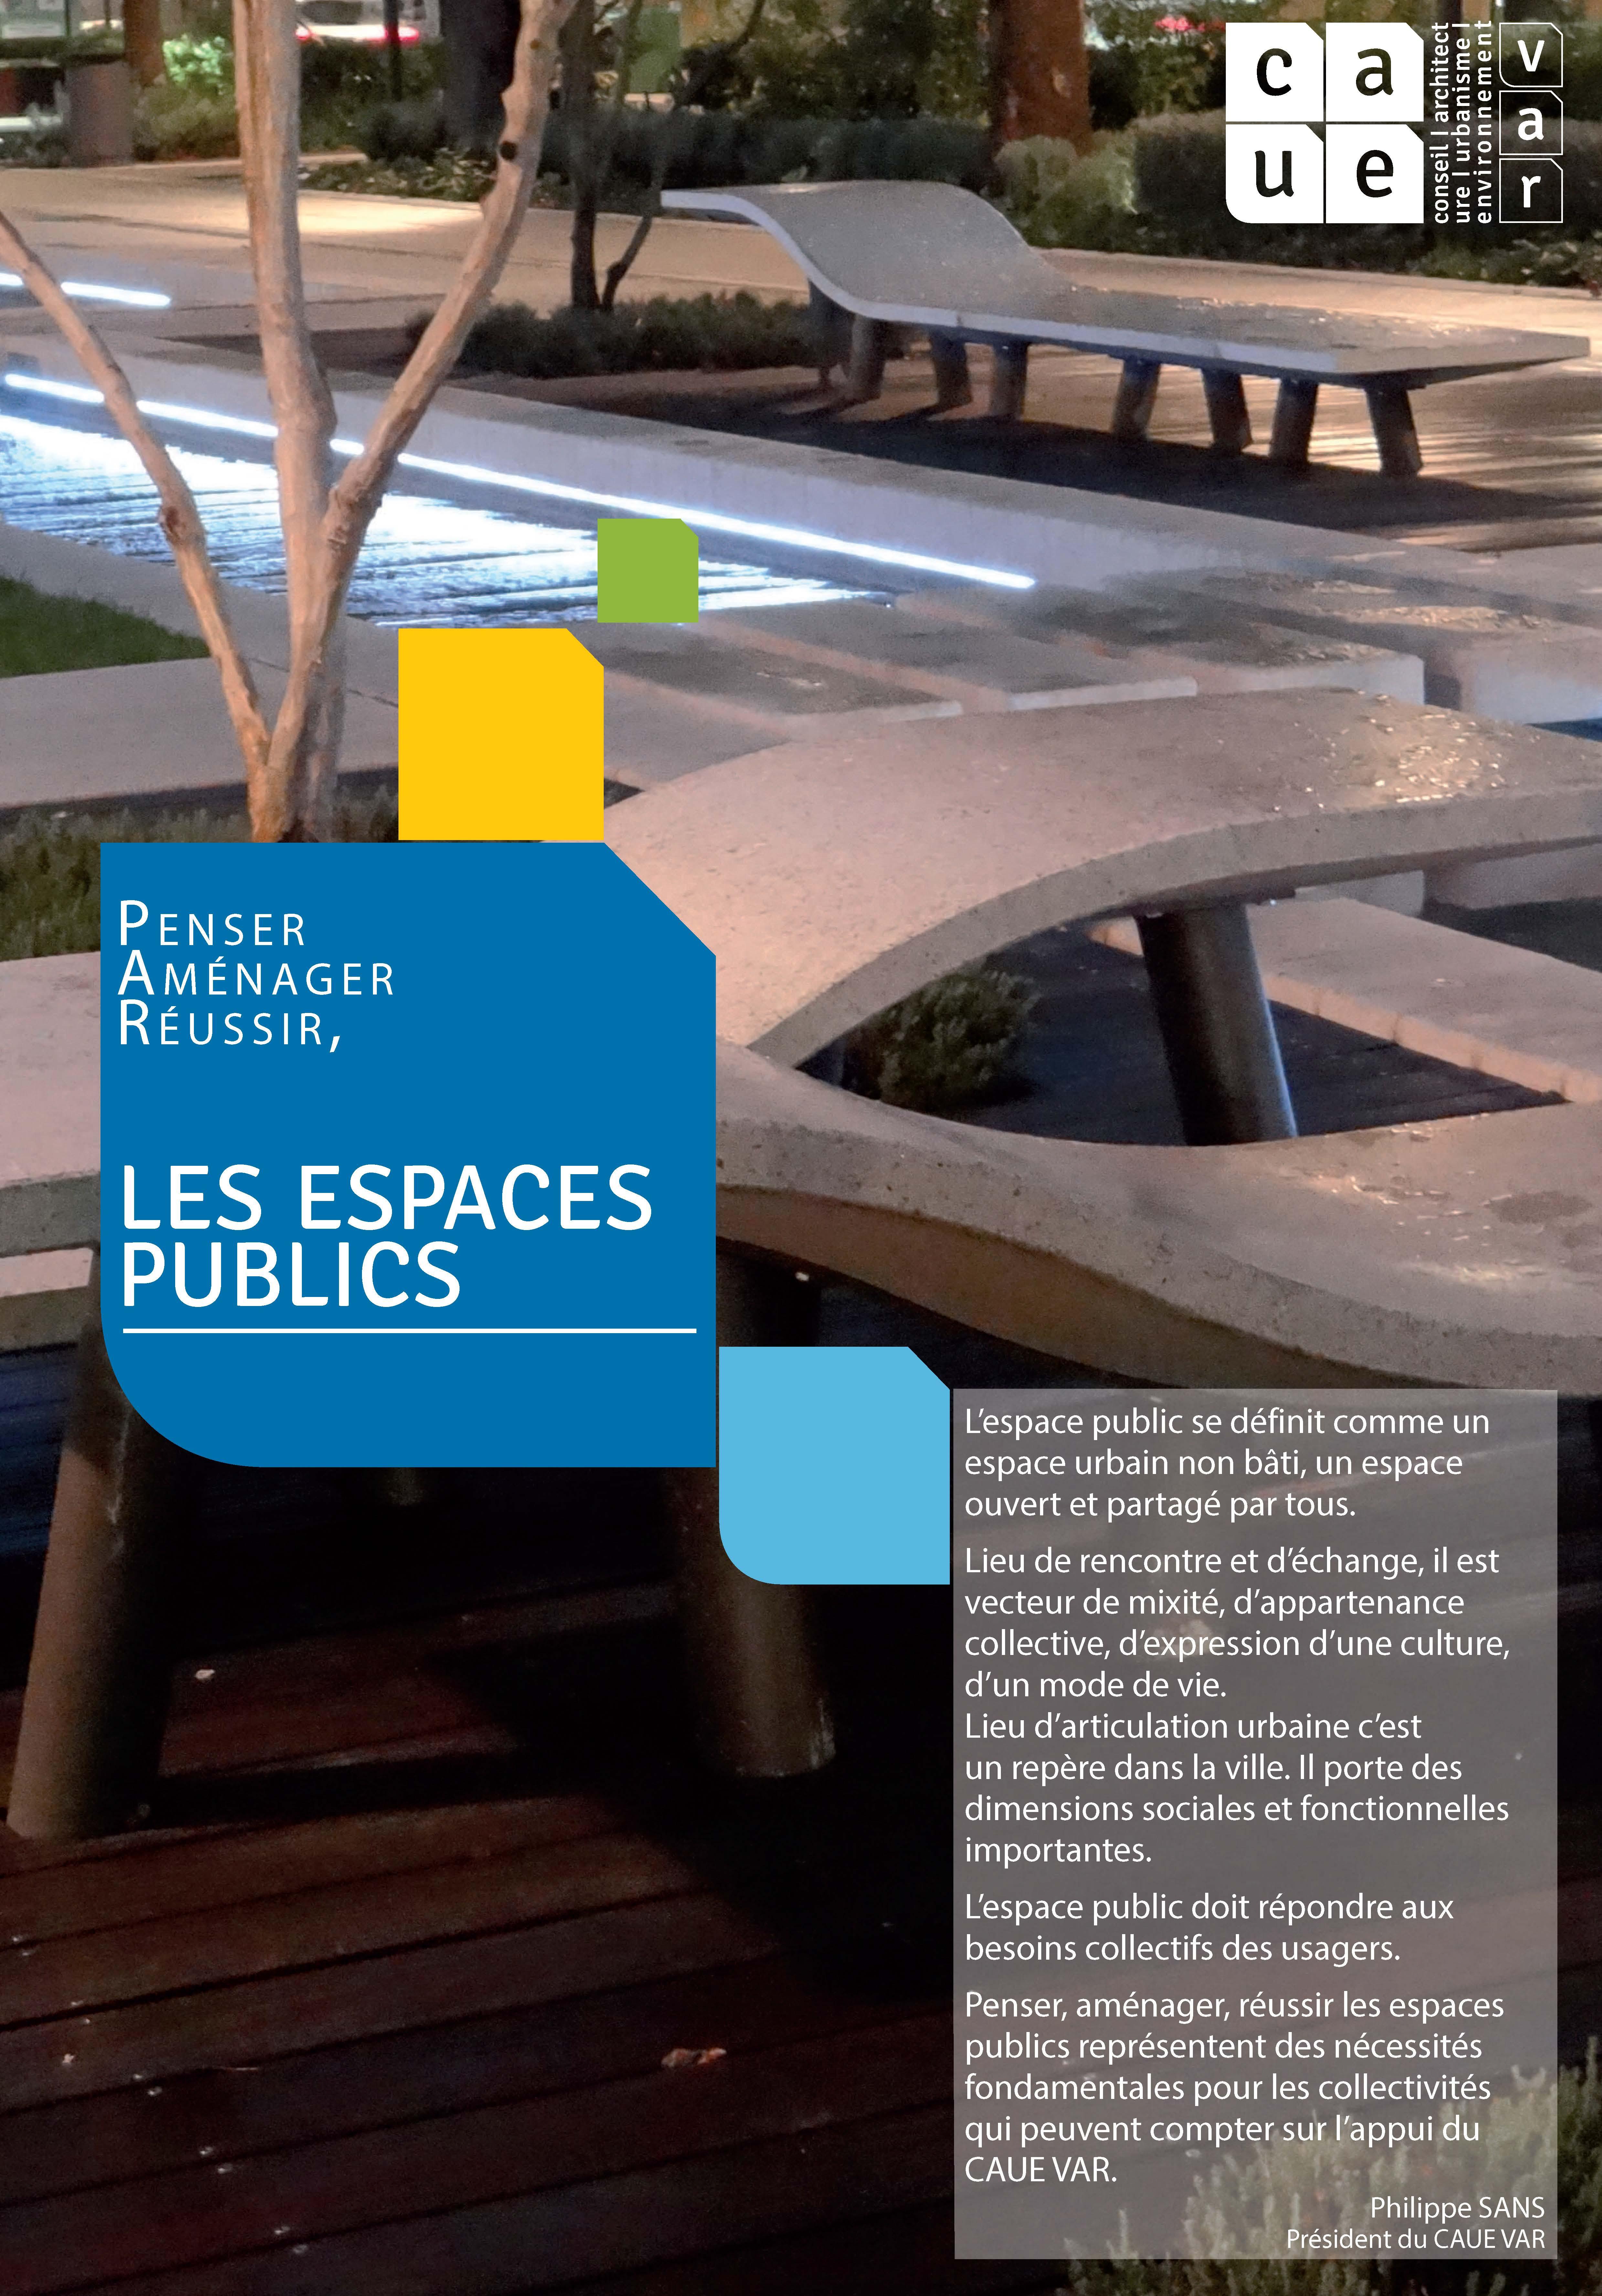 Les espaces publics